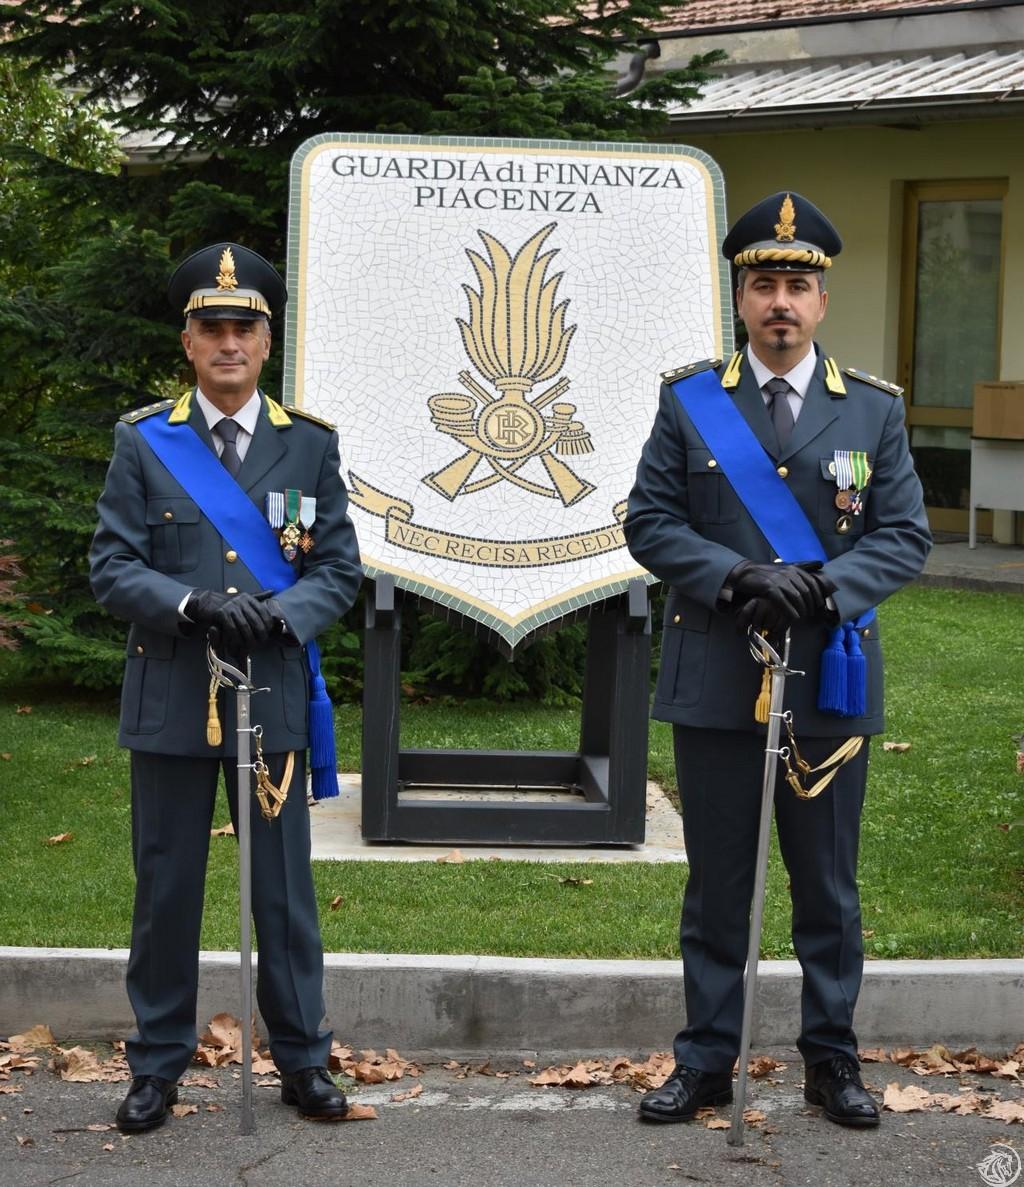 Guardia-di-Finanza-Piacenza